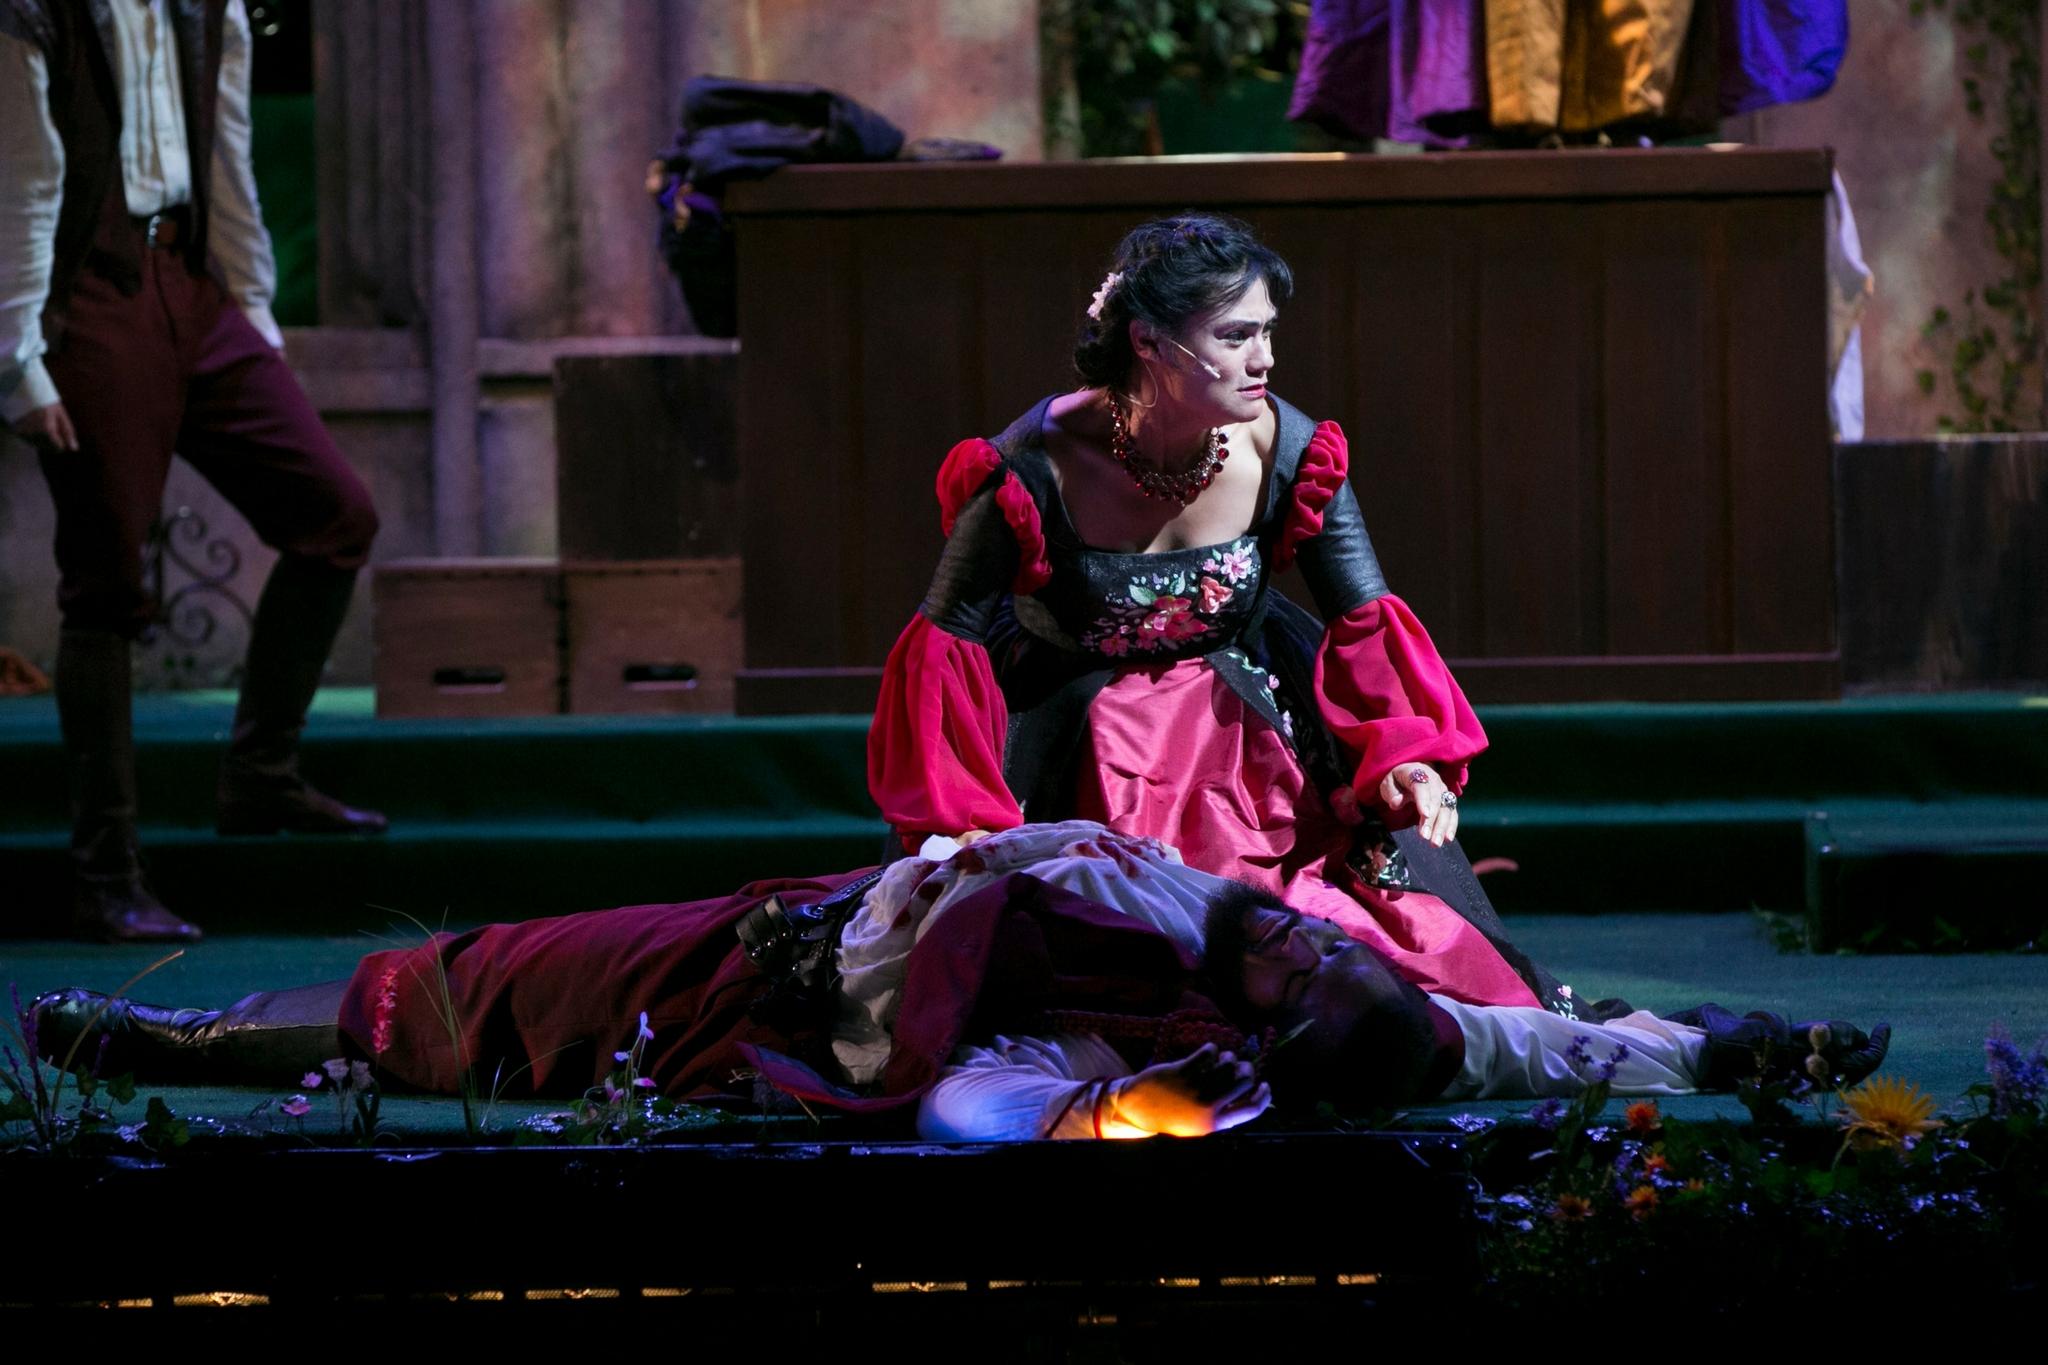 Celeste Oliva (Lady Capulet) in Romeo & Juliet, Shakespeare on the Common 2017-Photo by Evgenia Eliseeva